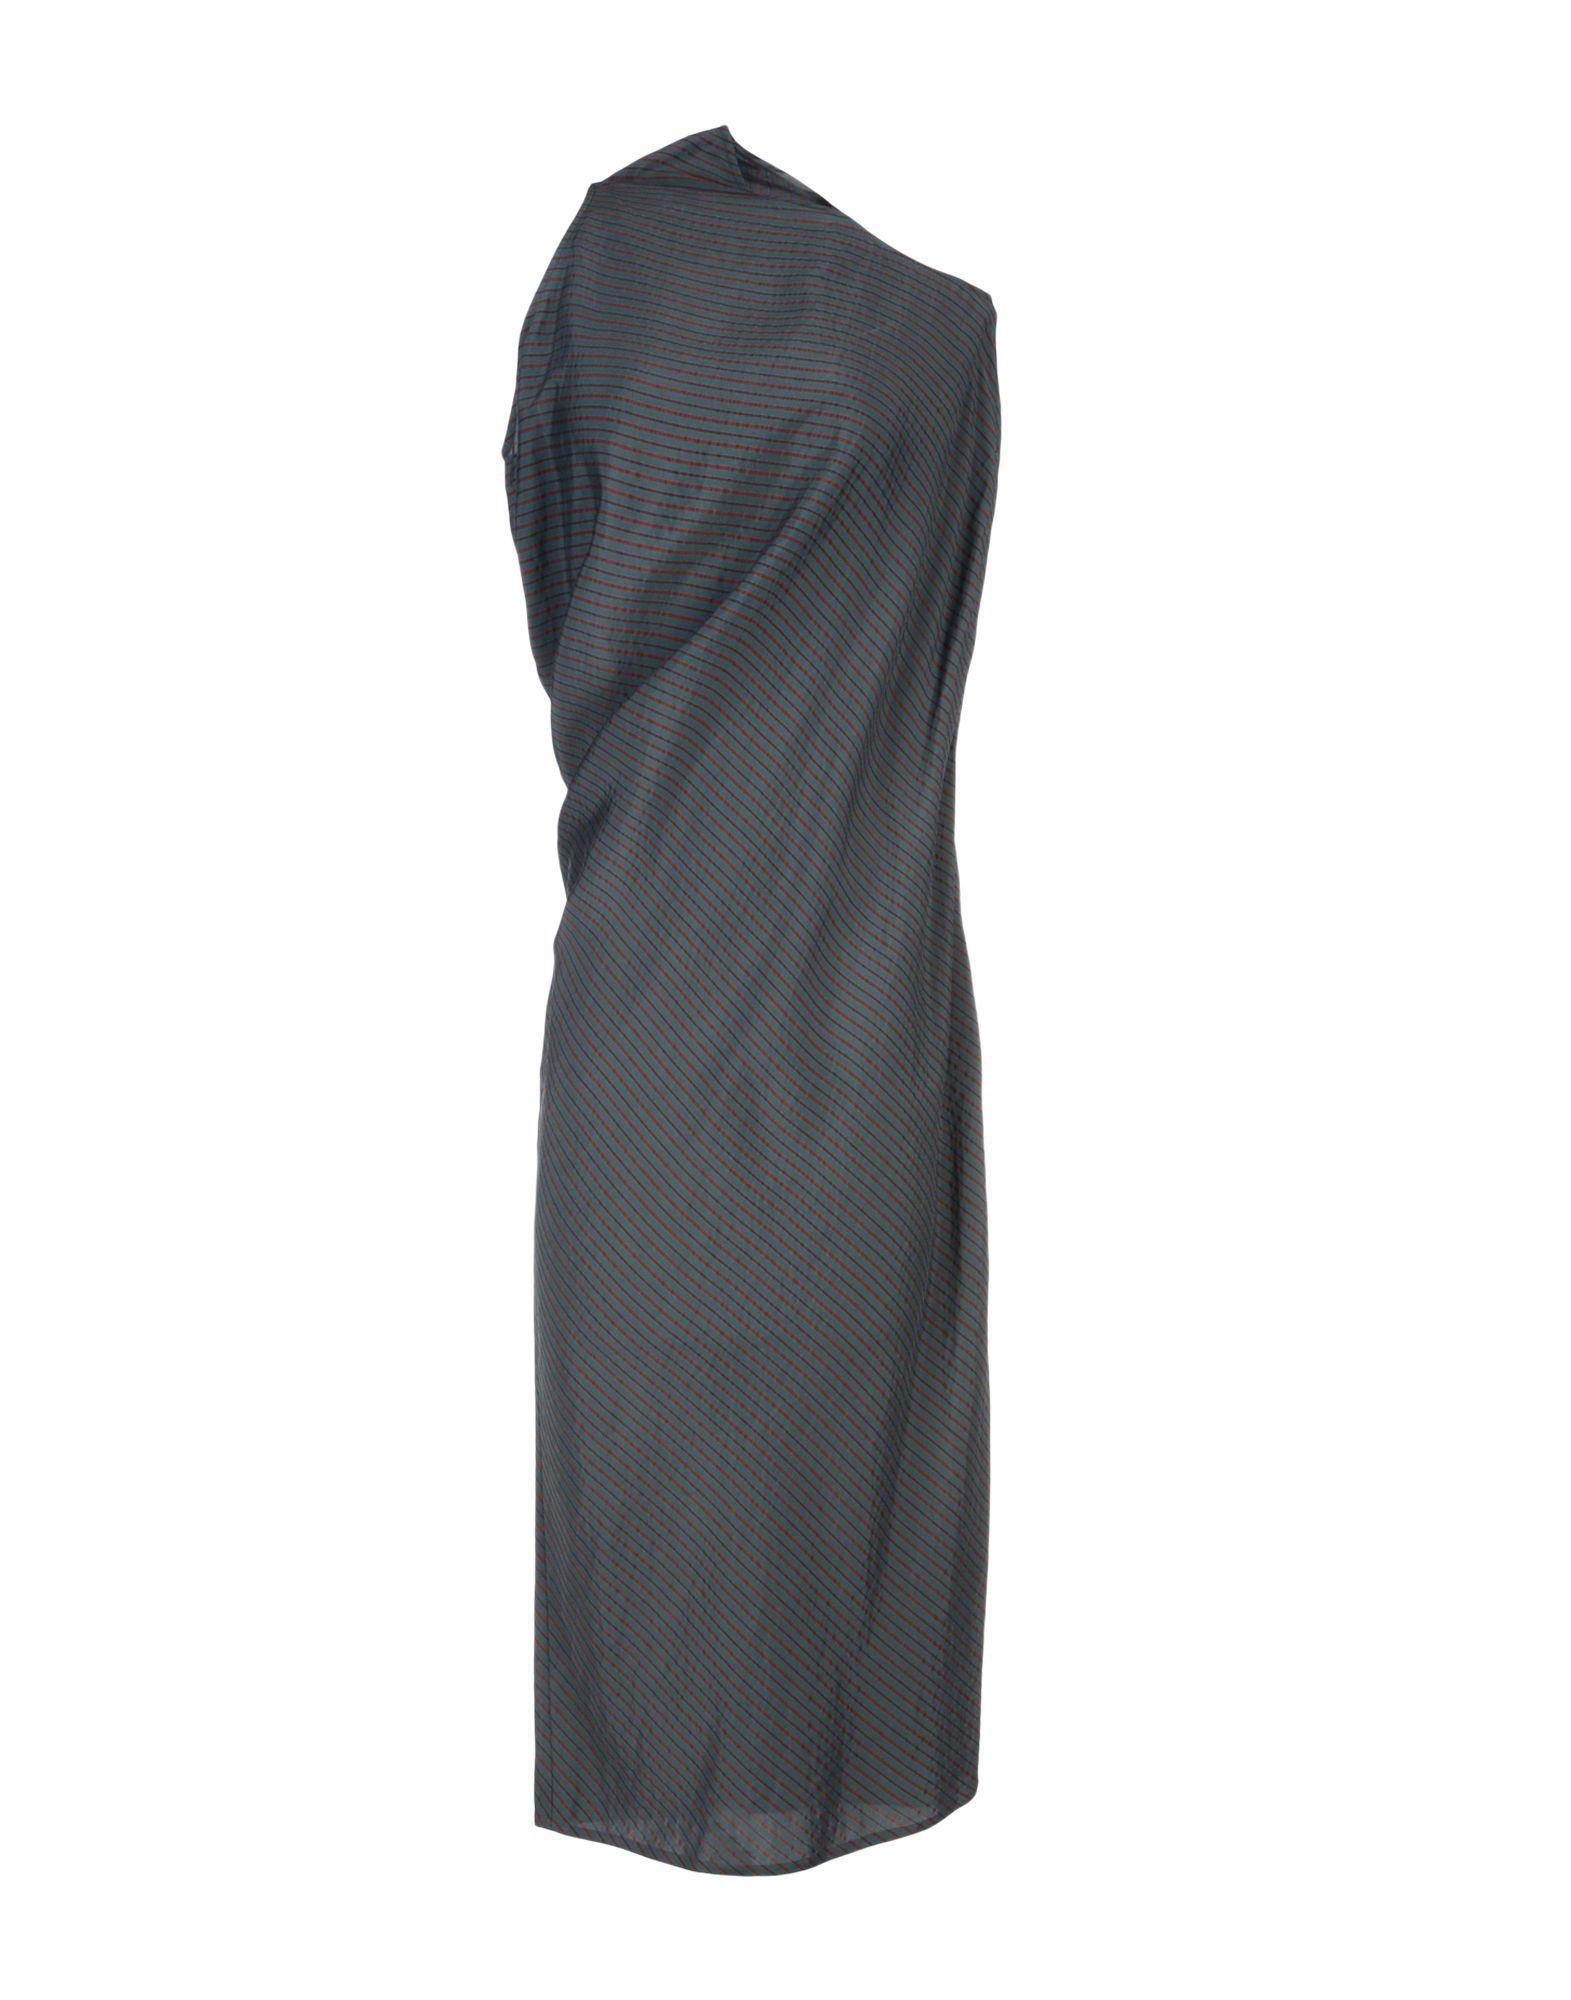 MM6 Maison Margiela Dark Green Draped Dress